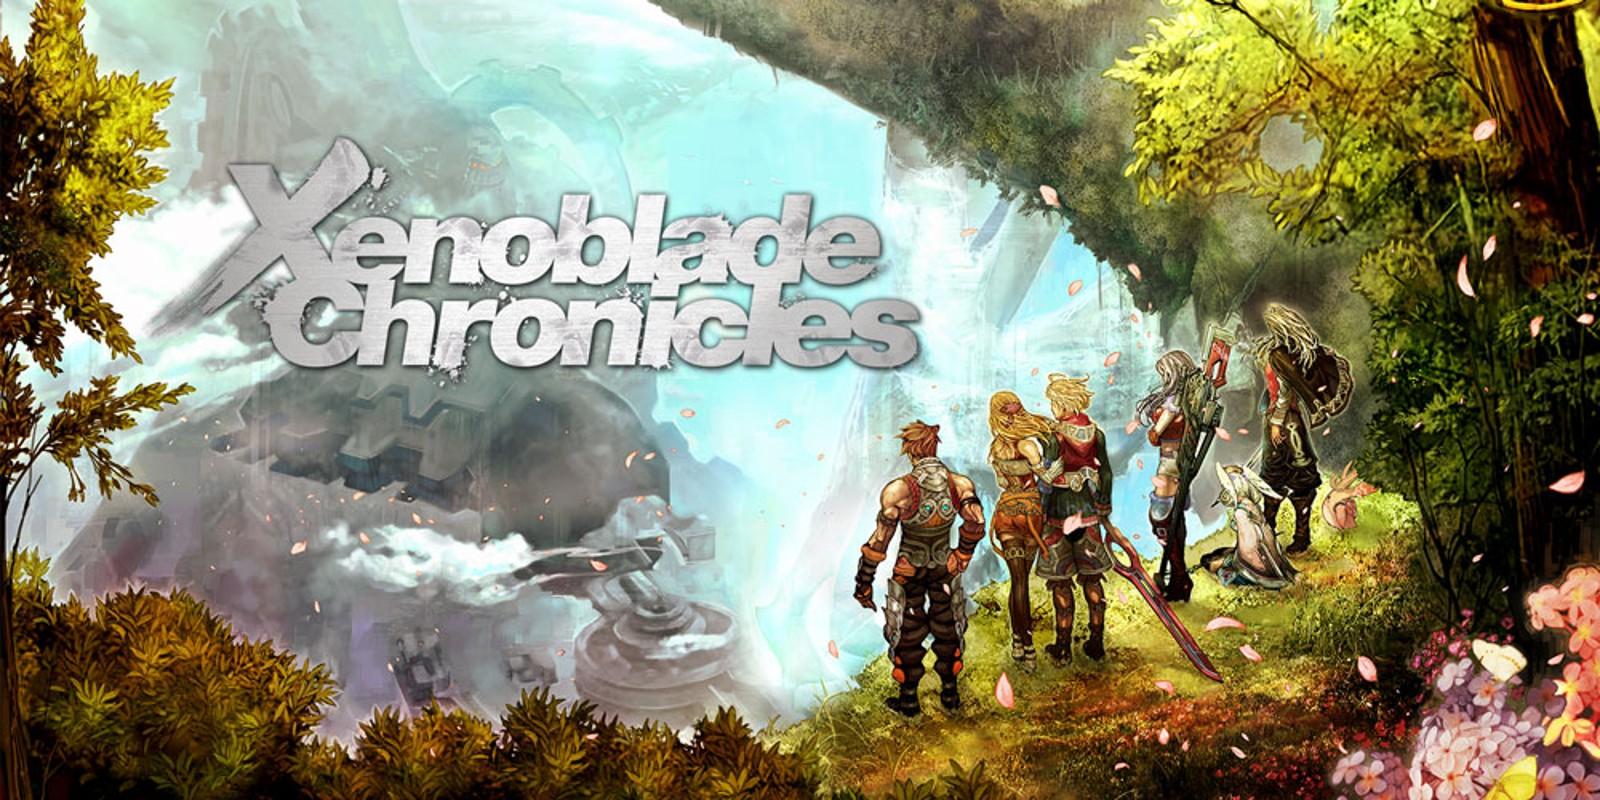 5. (ex aequo) Xenoblade Chronicles (Nintendo Wii) - wynik Metacritic: 92/100